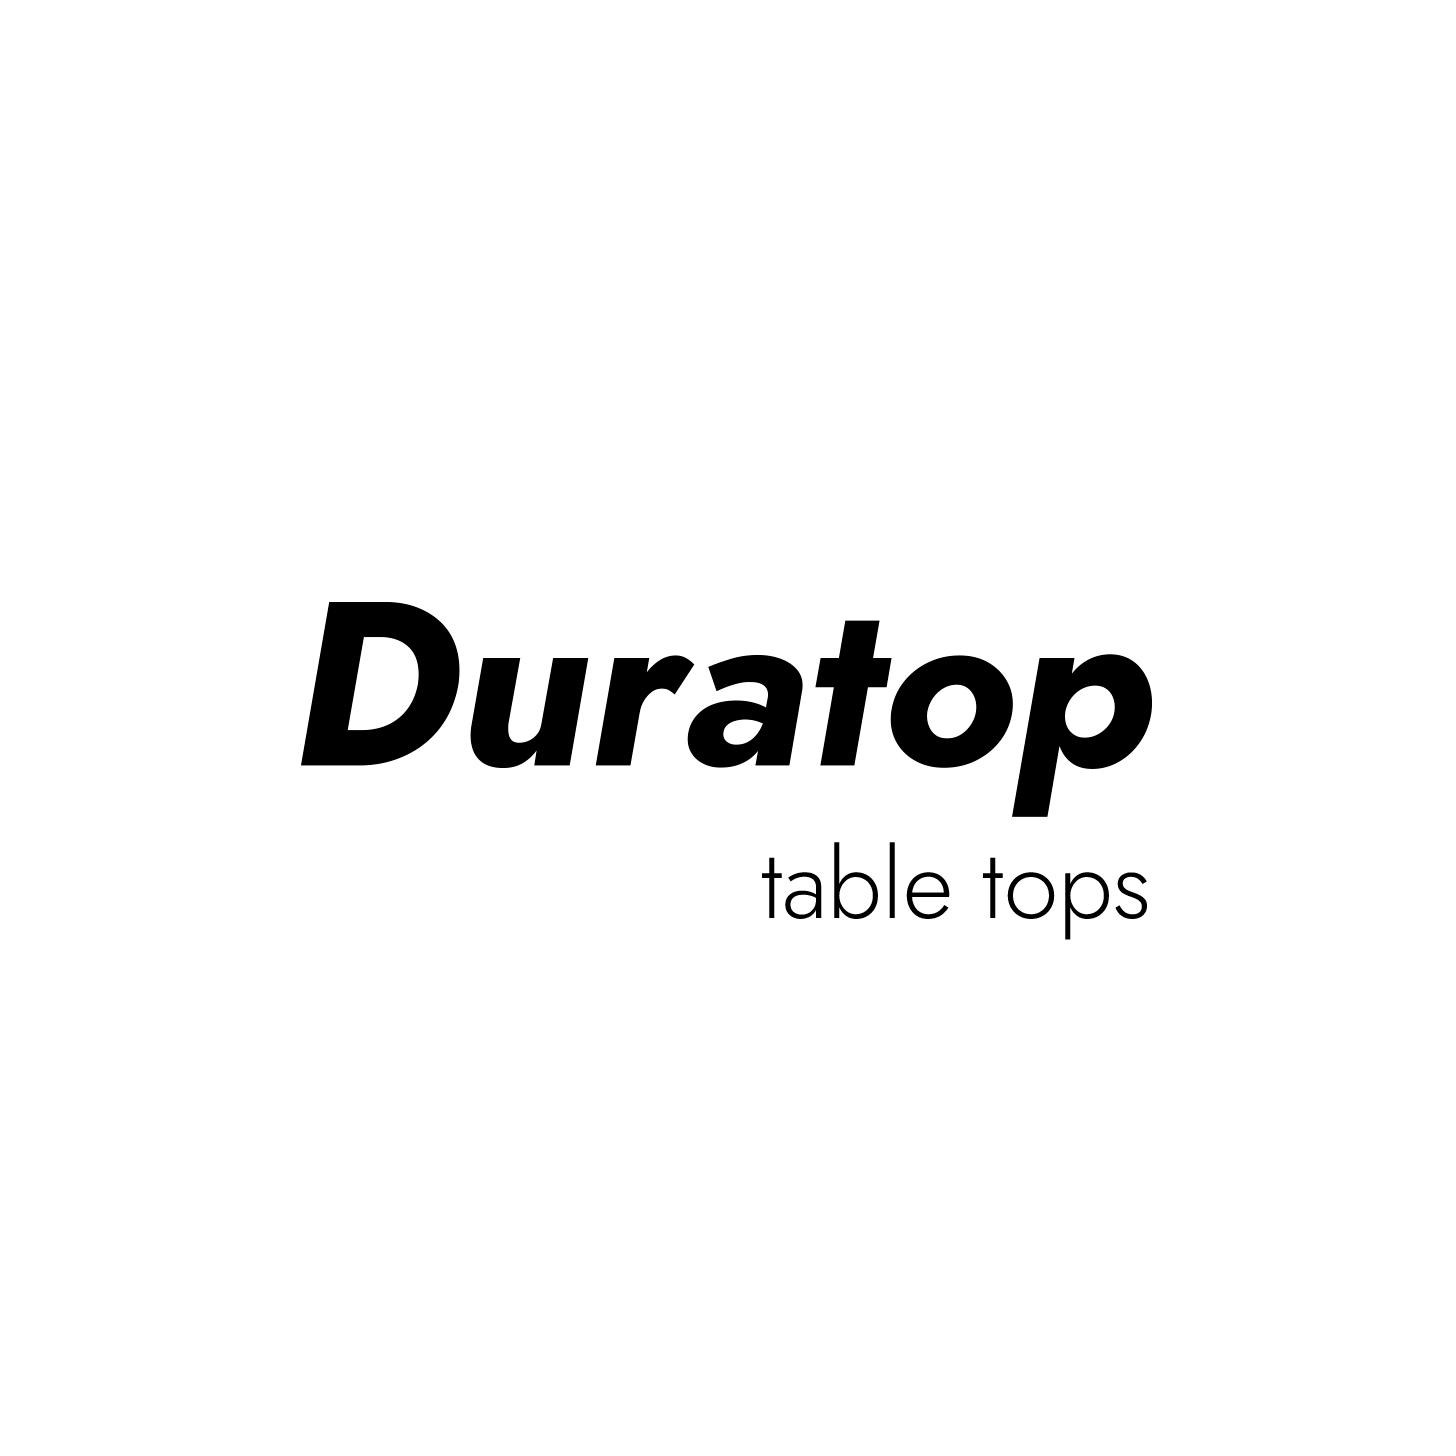 Duratop